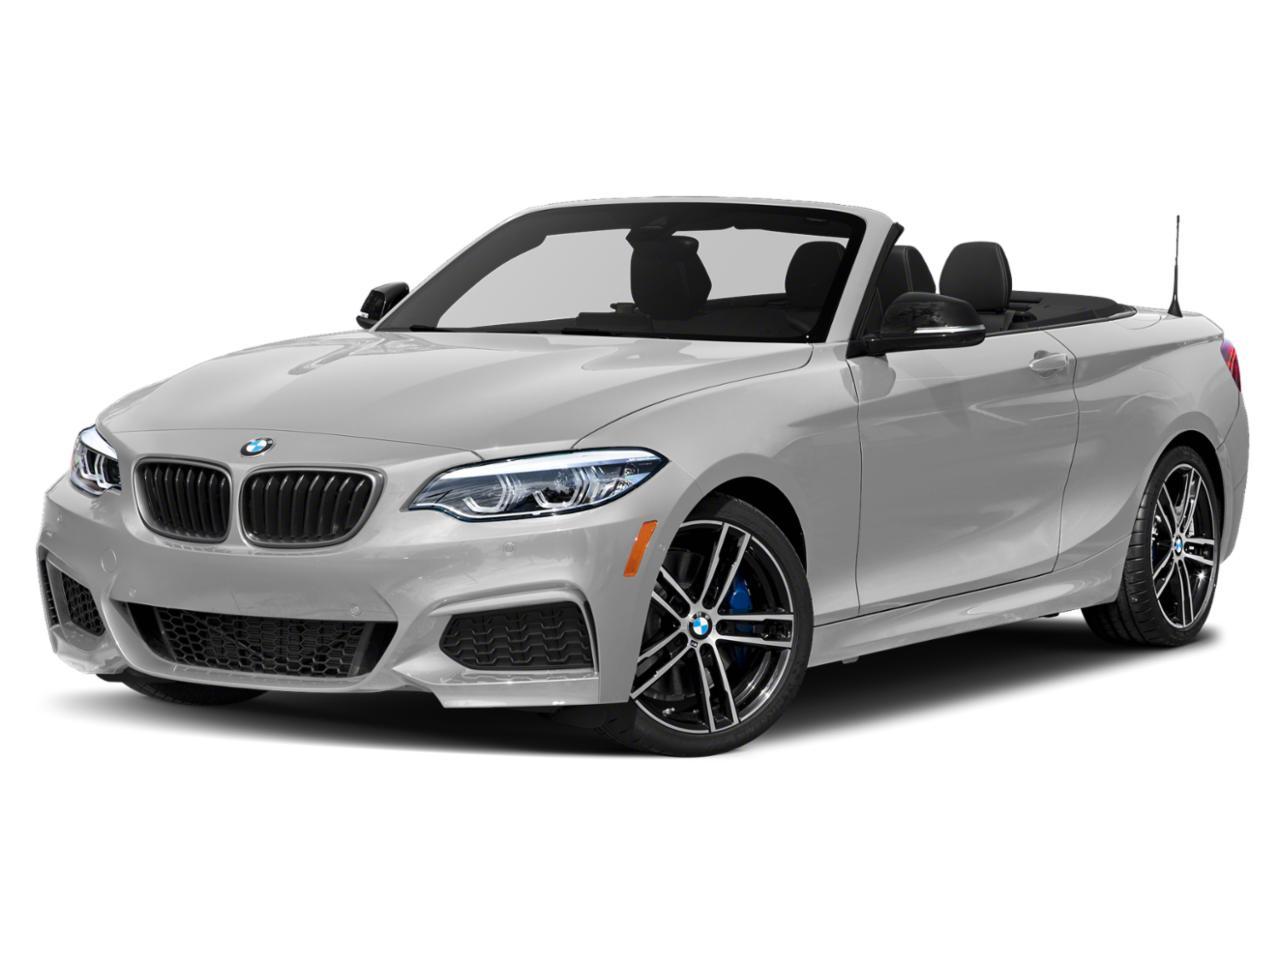 2021 BMW M240i Vehicle Photo in Grapevine, TX 76051